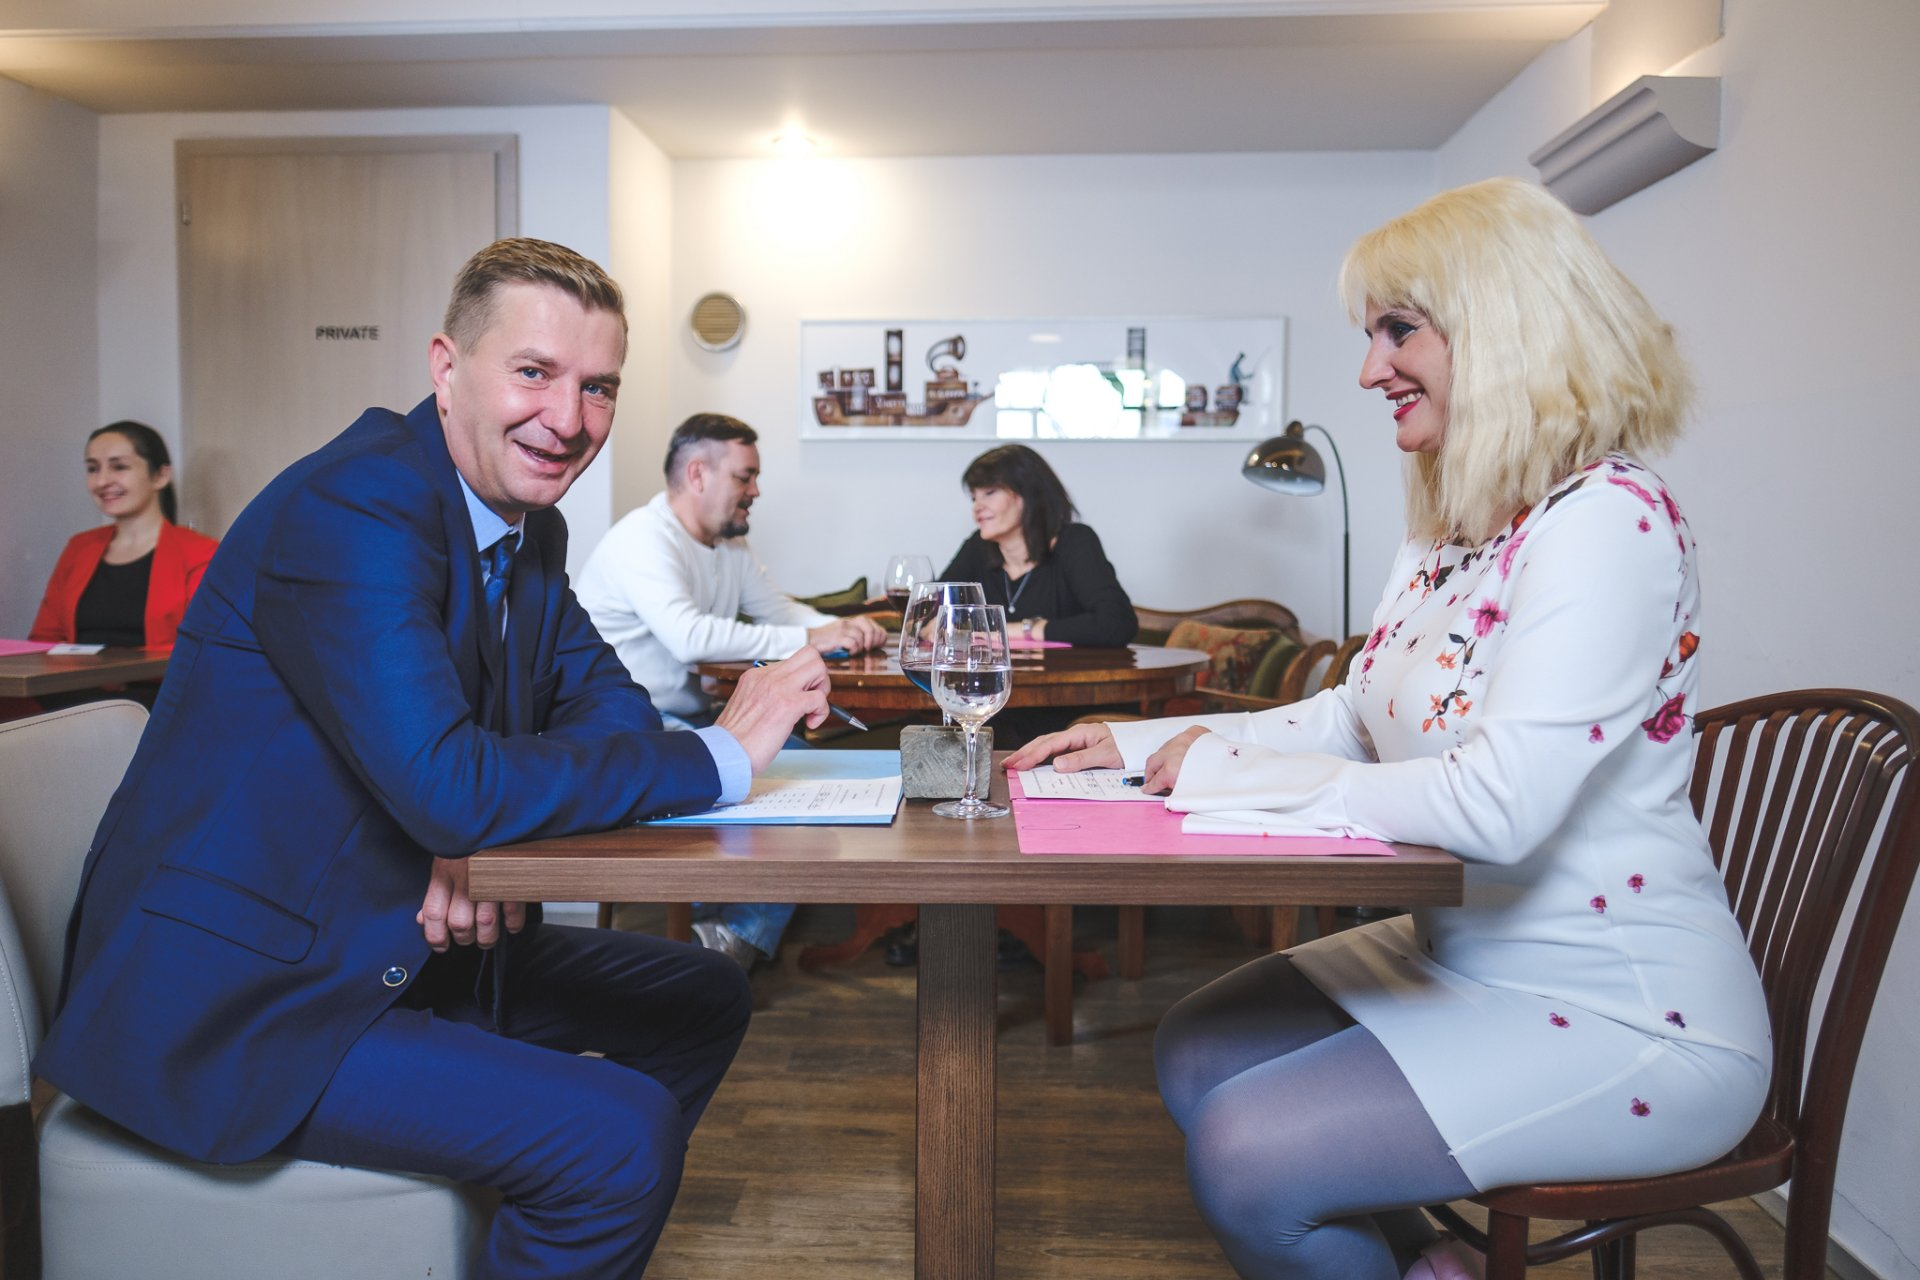 Ona hled jeho Pardubice | ELITE Date